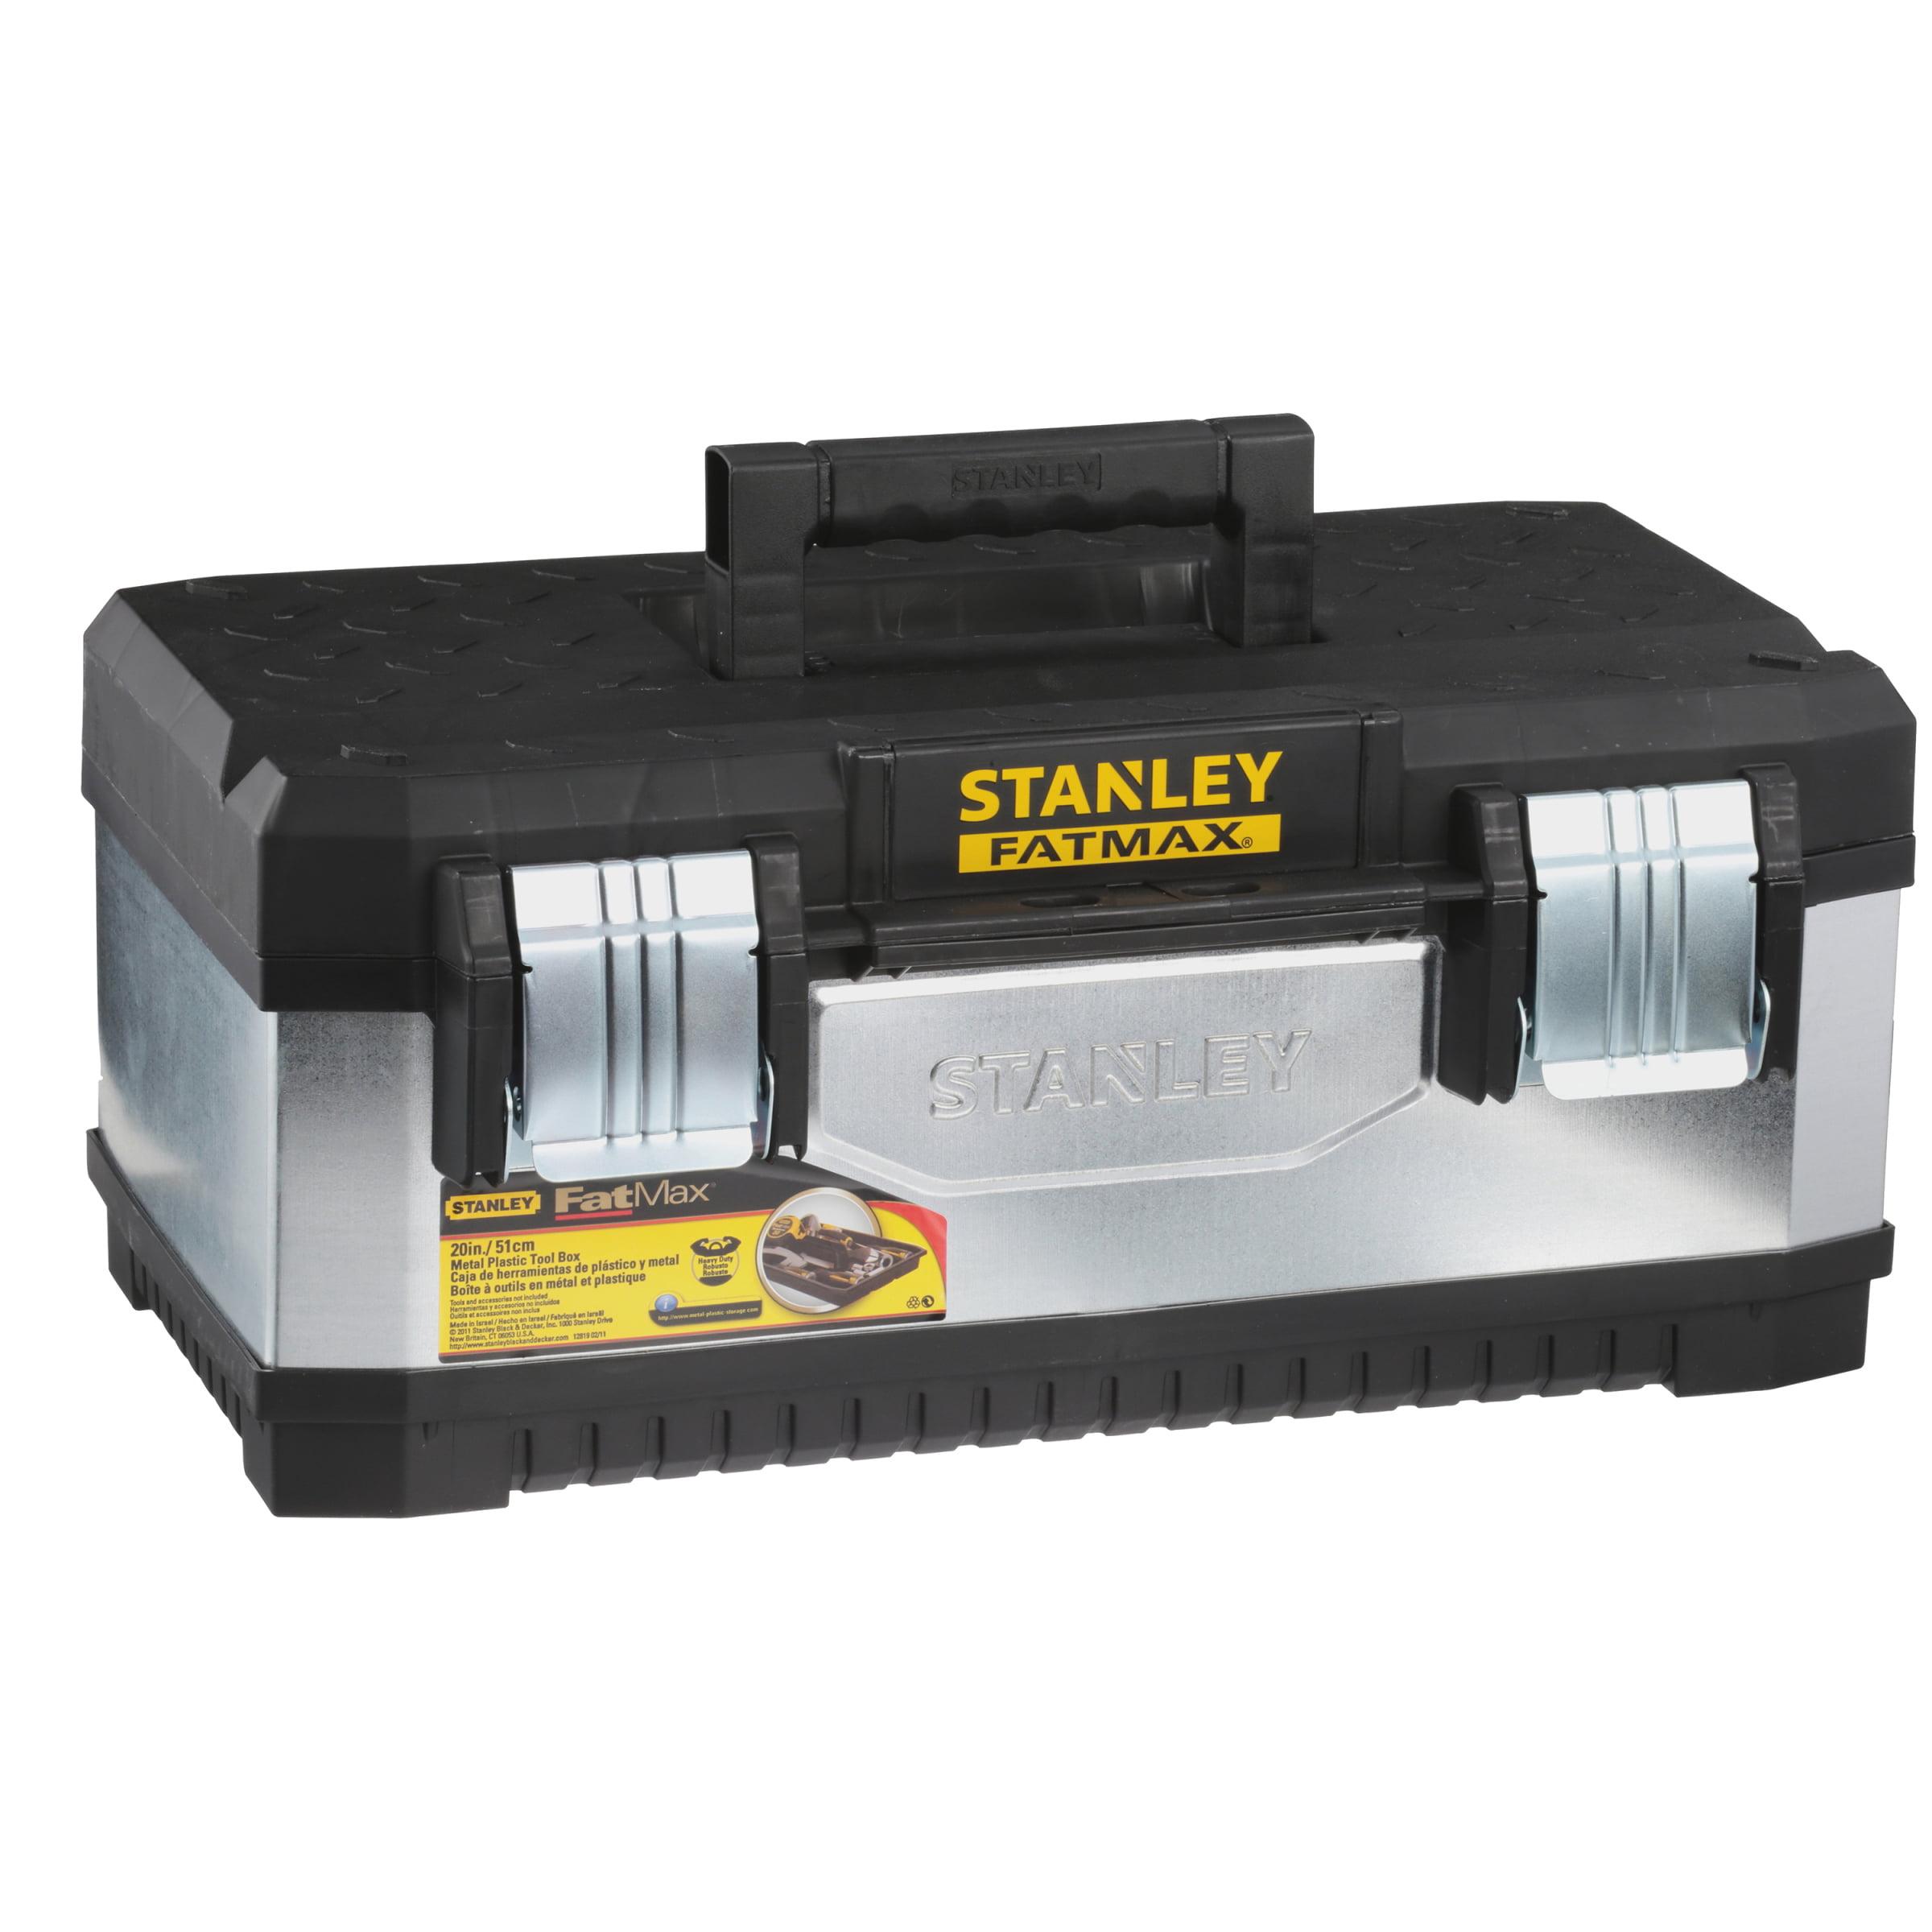 "Stanley Storage FMST20061 20"" Metal & Plastic Tool Box by Stanley Hand Tools"